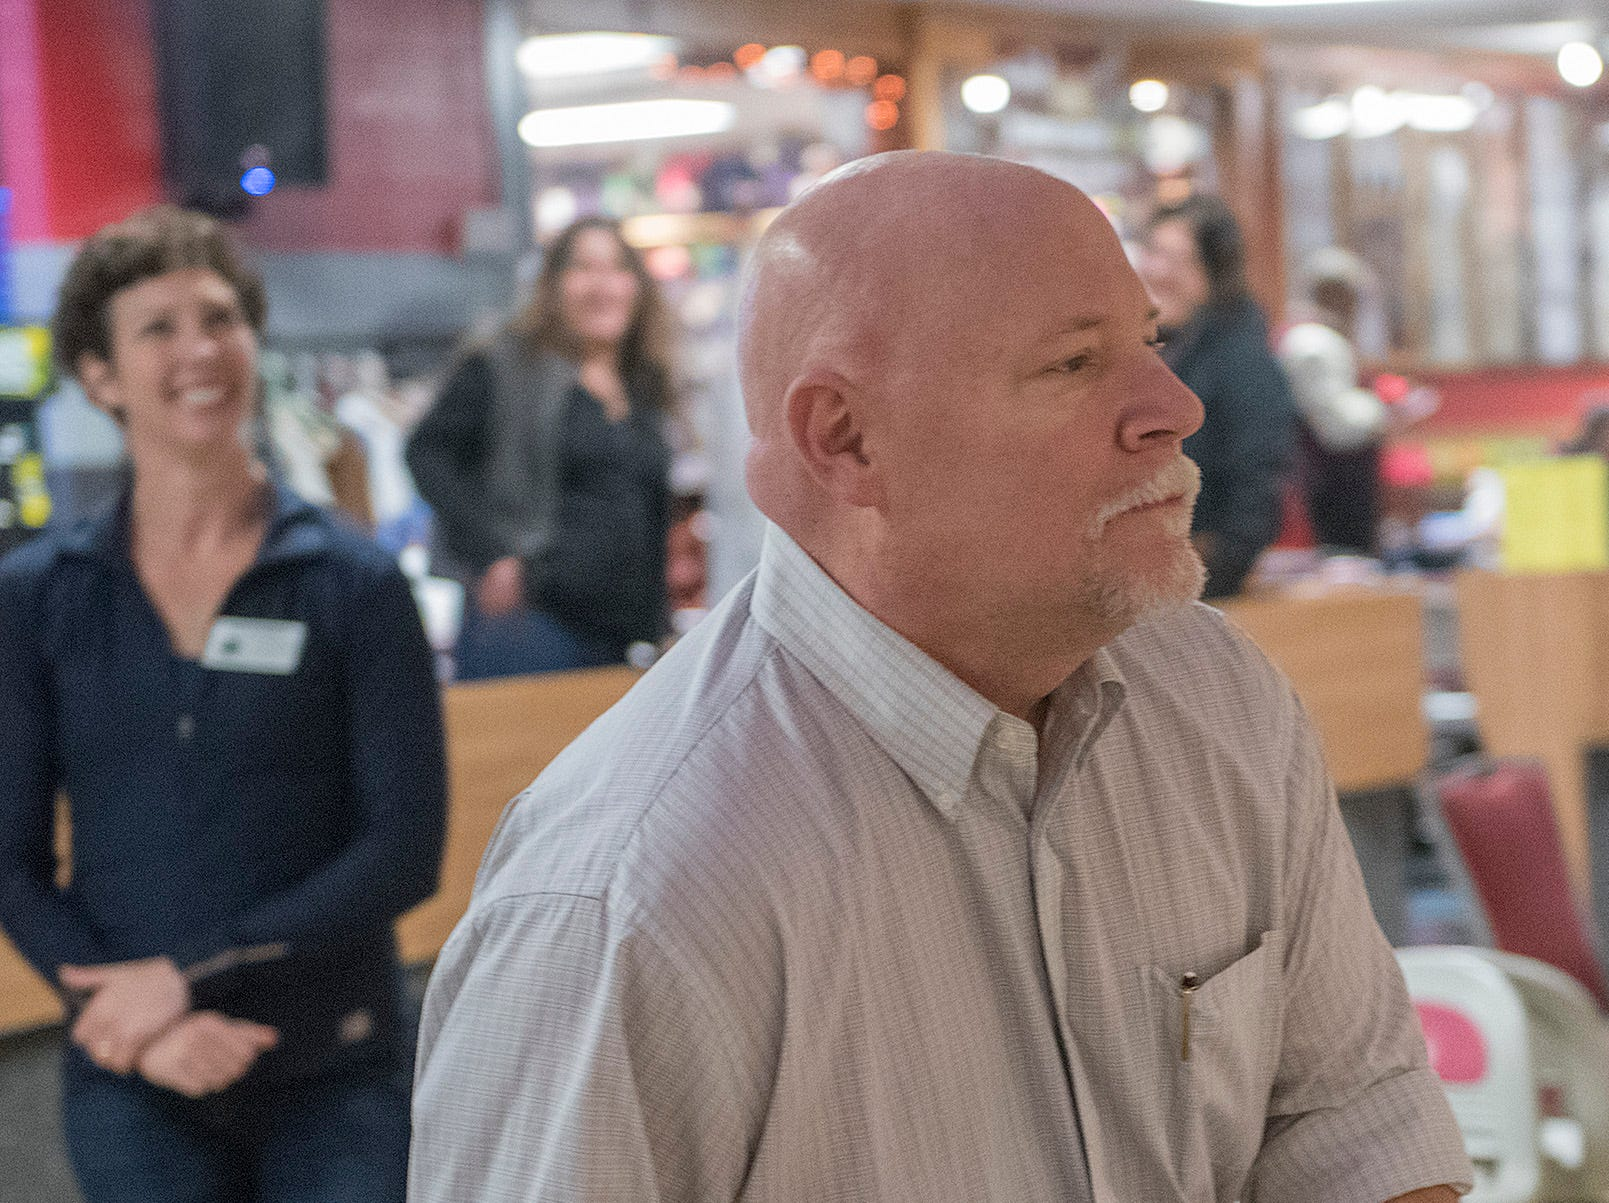 Farmington Hills Mayor Ken Massey begins his approach.